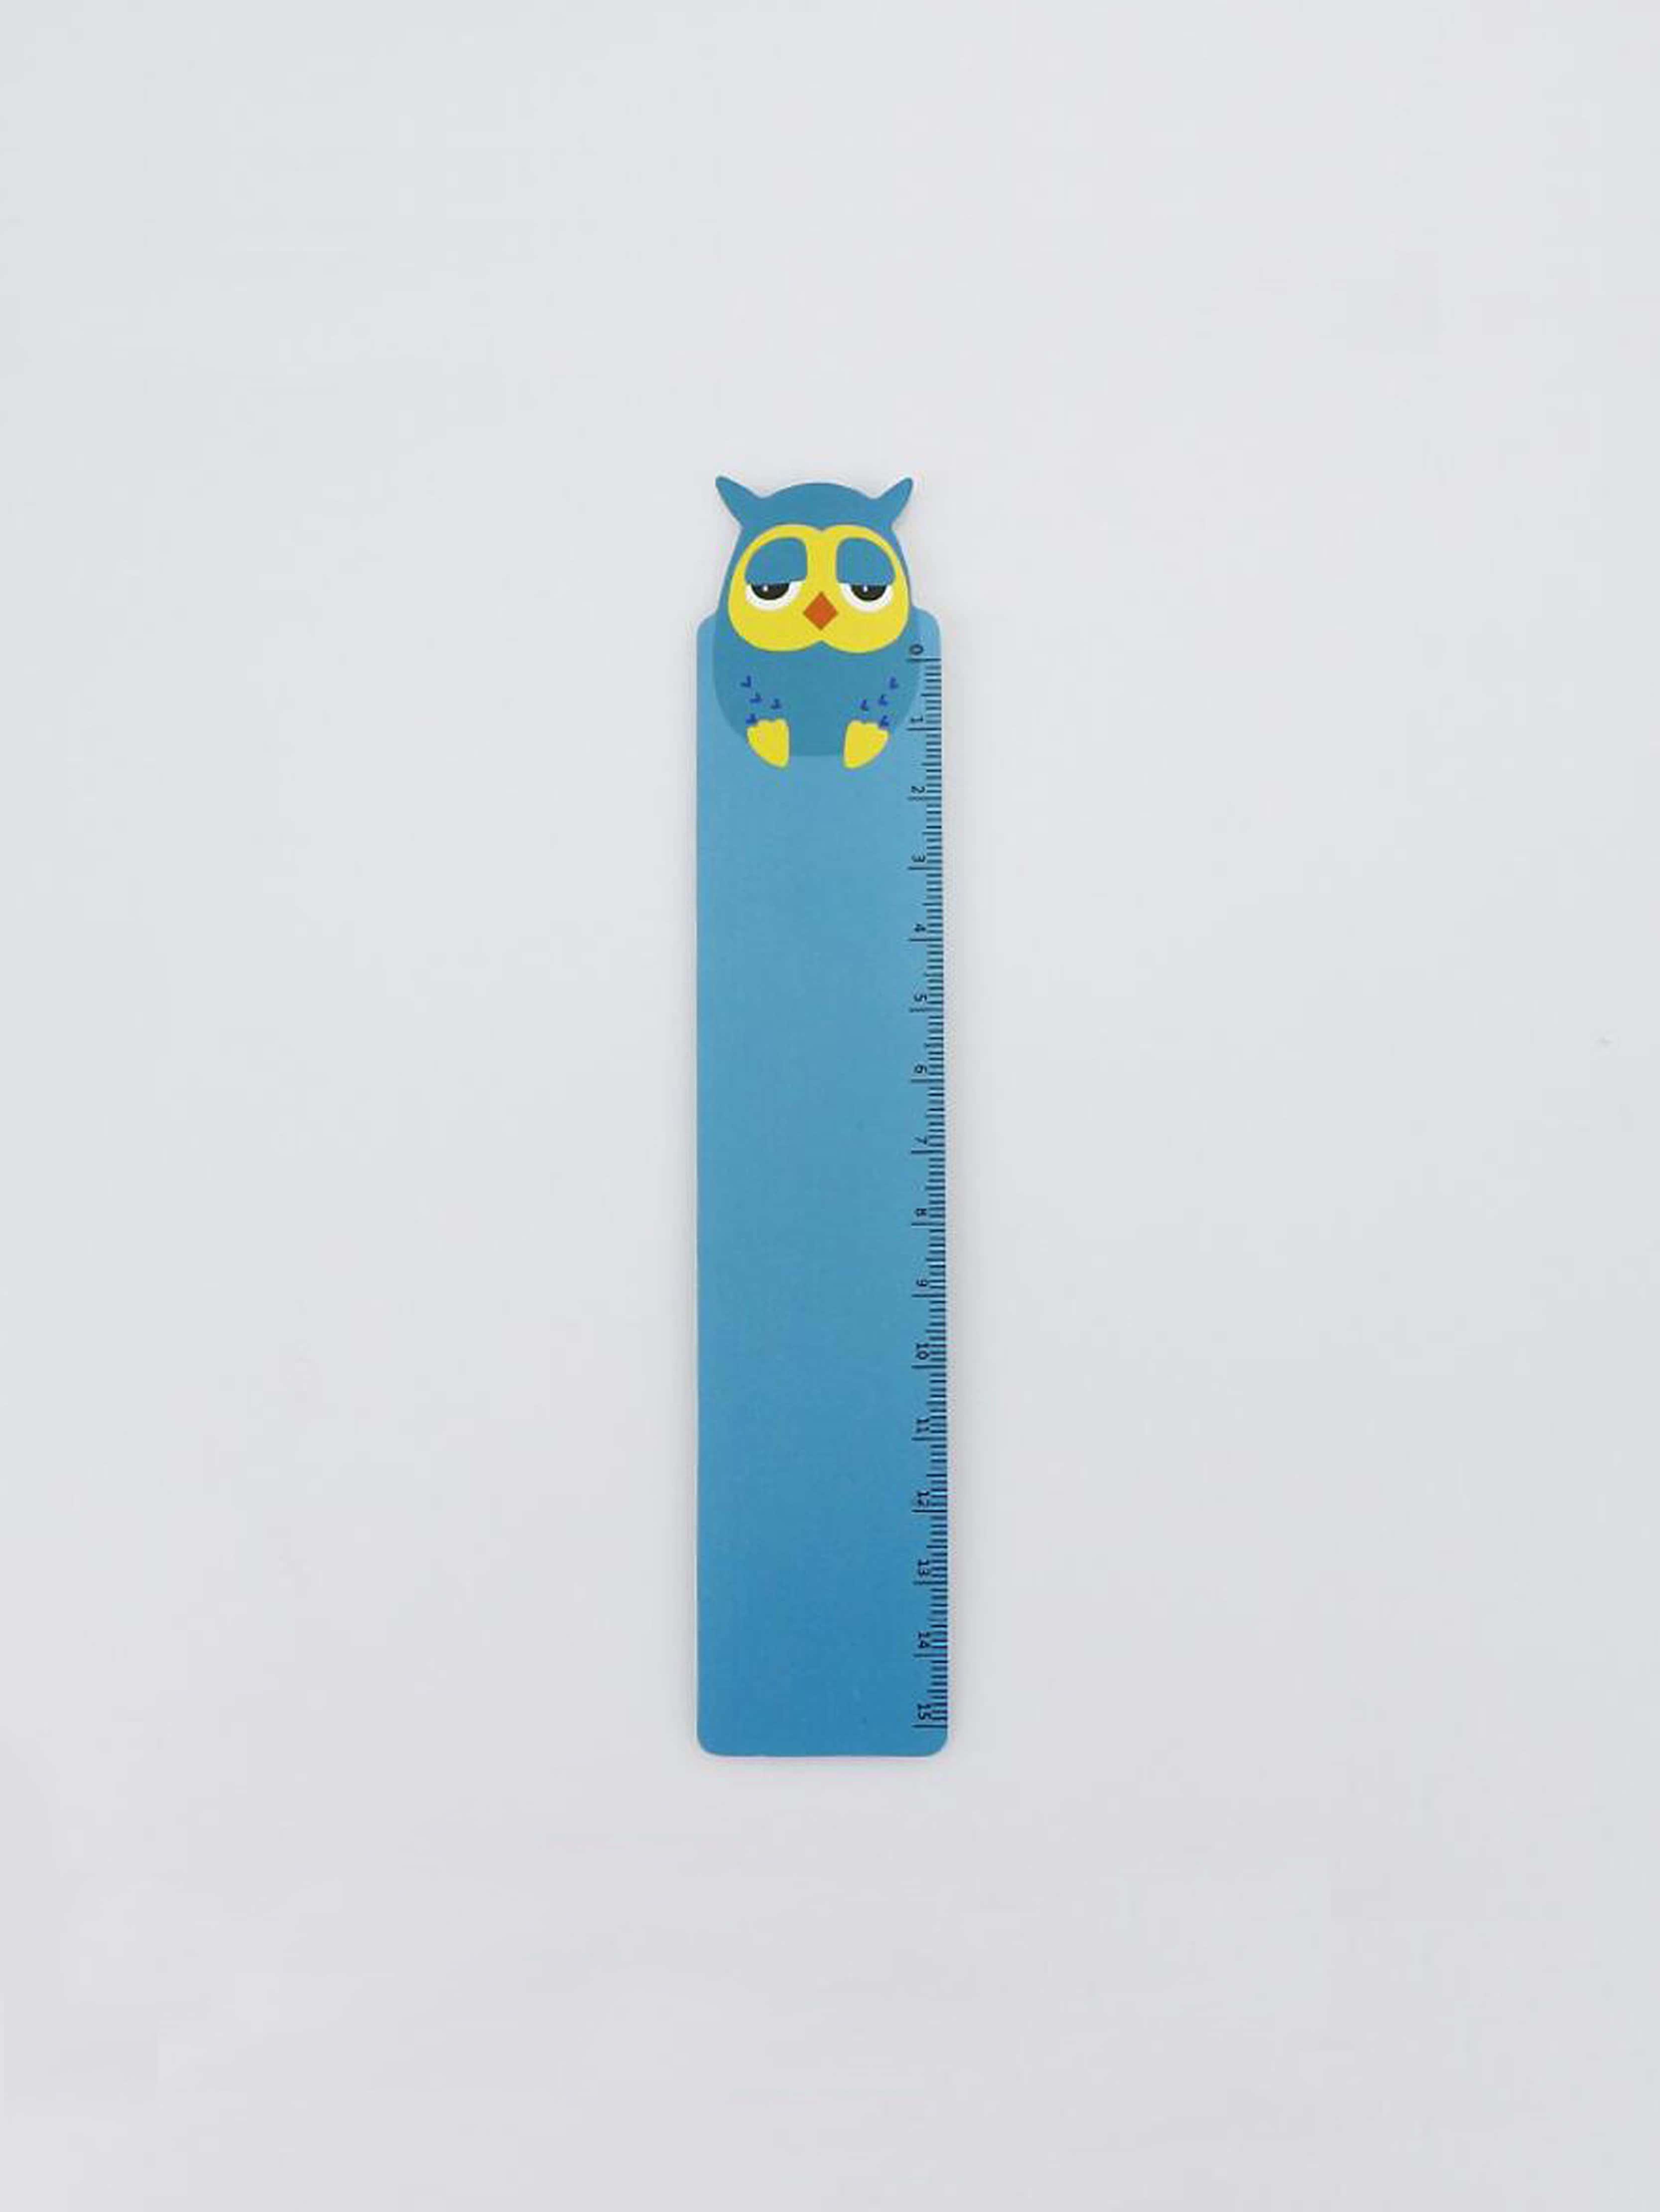 Owl Ruler 15cm аксессуар комплект кабелей rockdale 15cm ic016 15cm